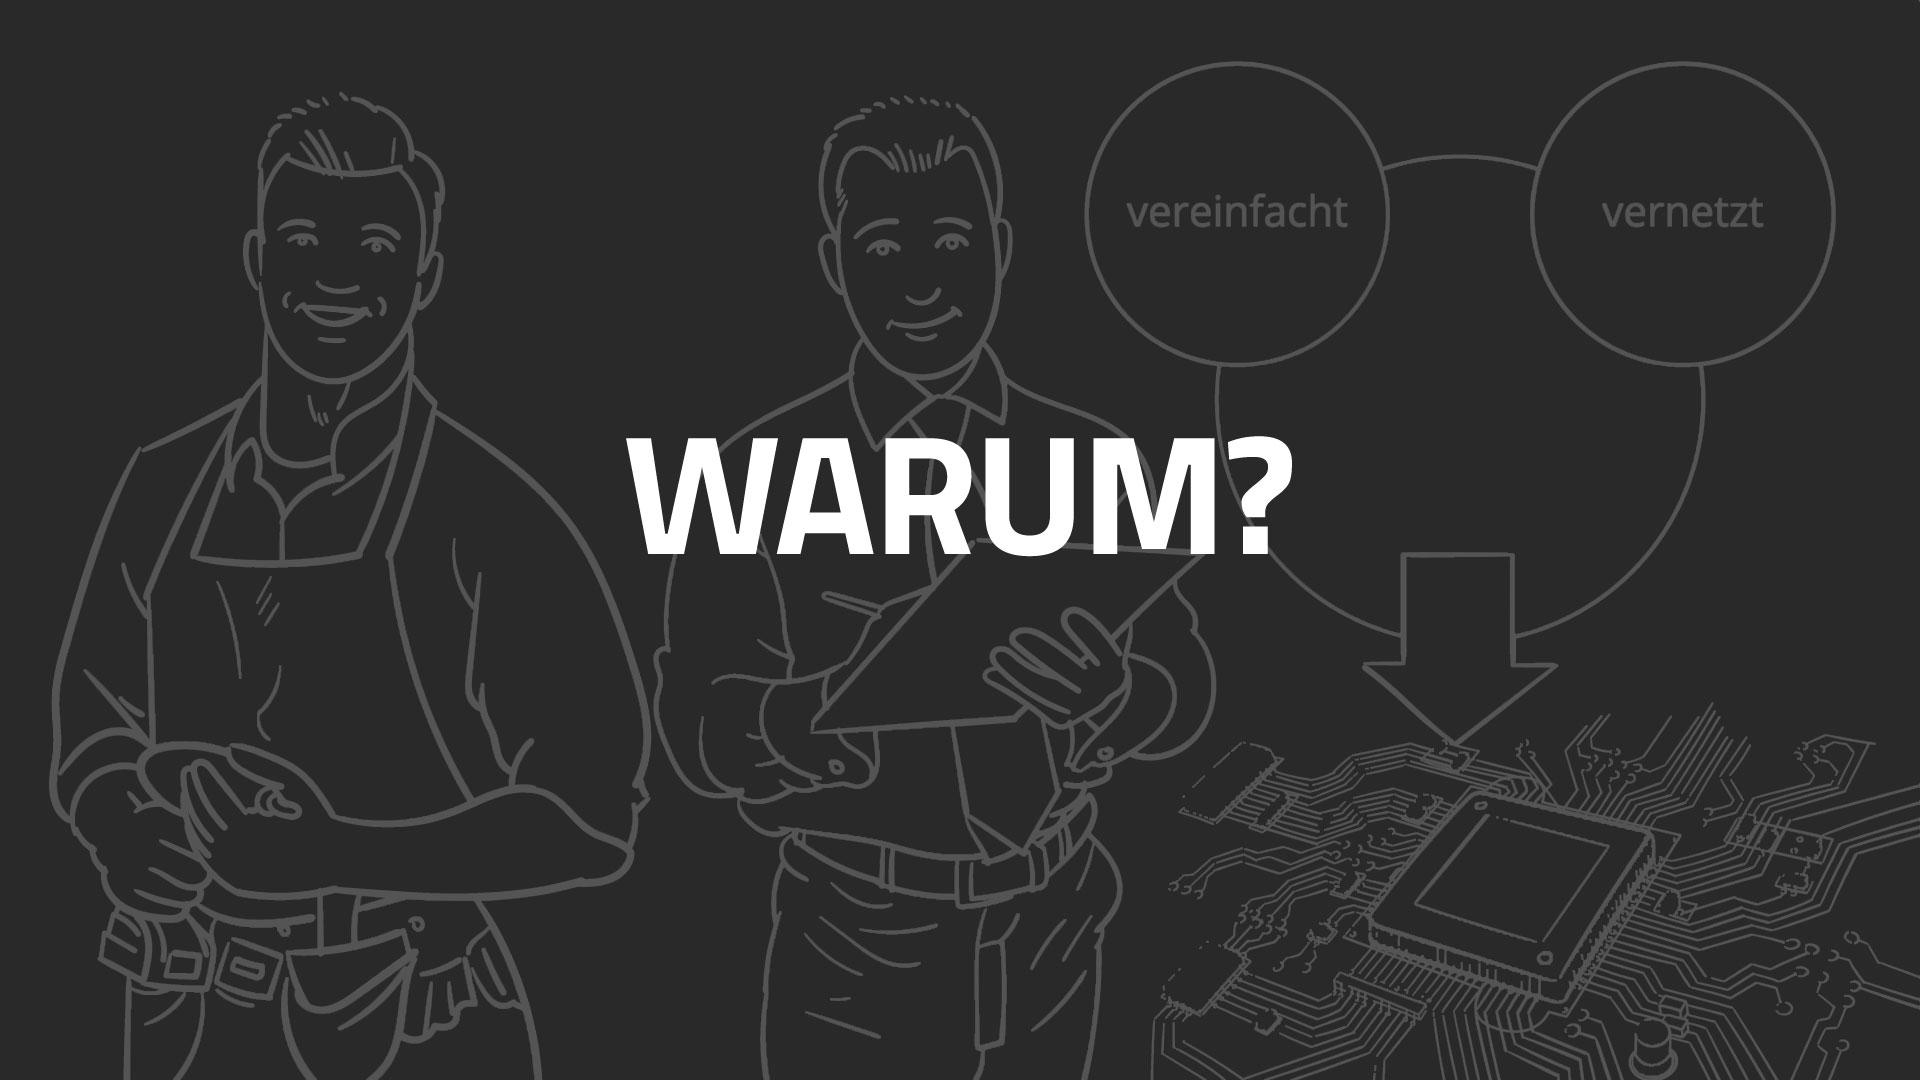 WARUM LEANCONNECT?